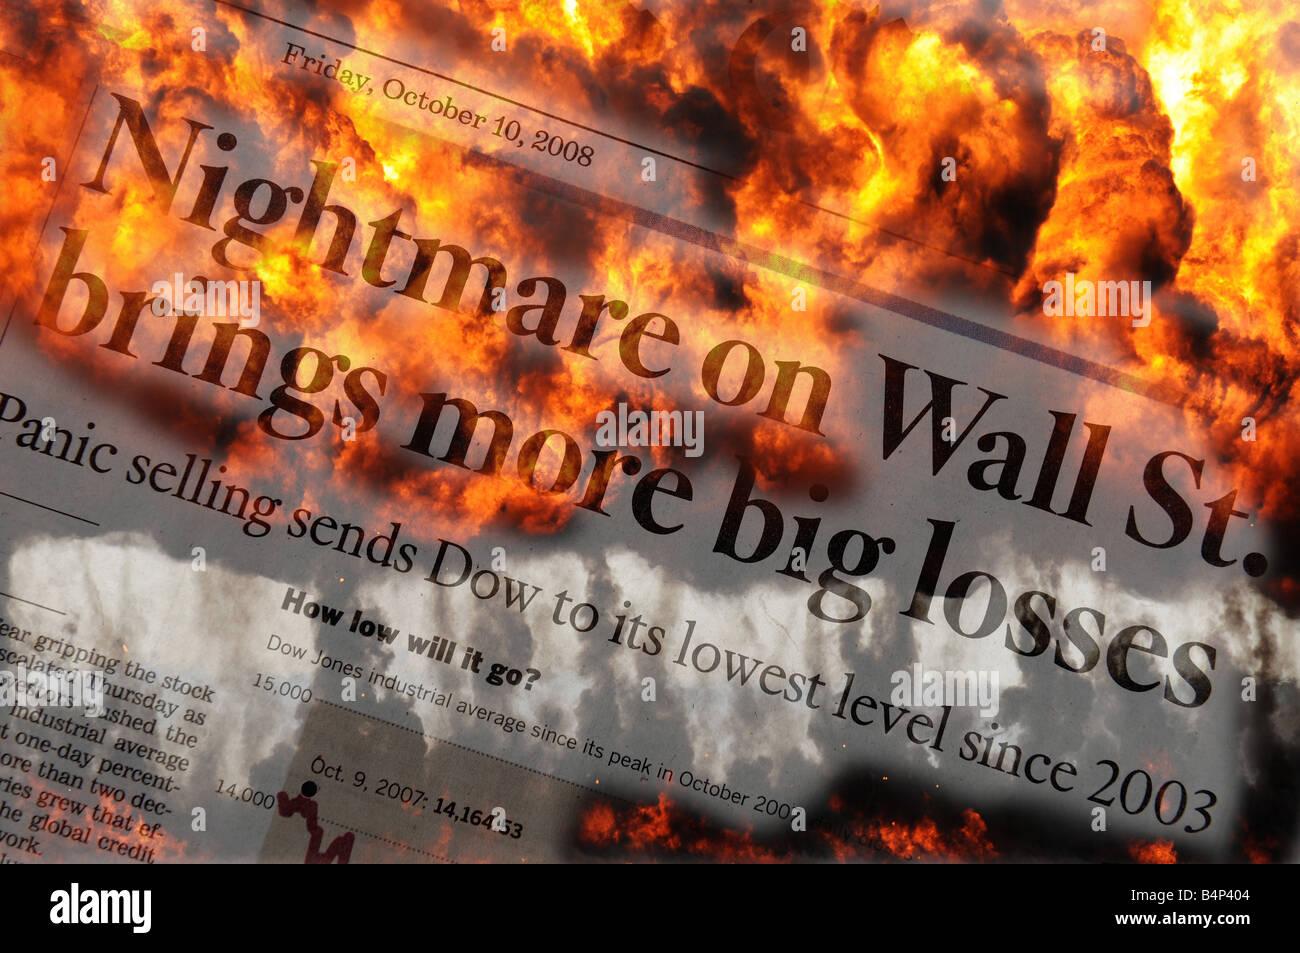 Nightmare on Wall Street - Stock Image